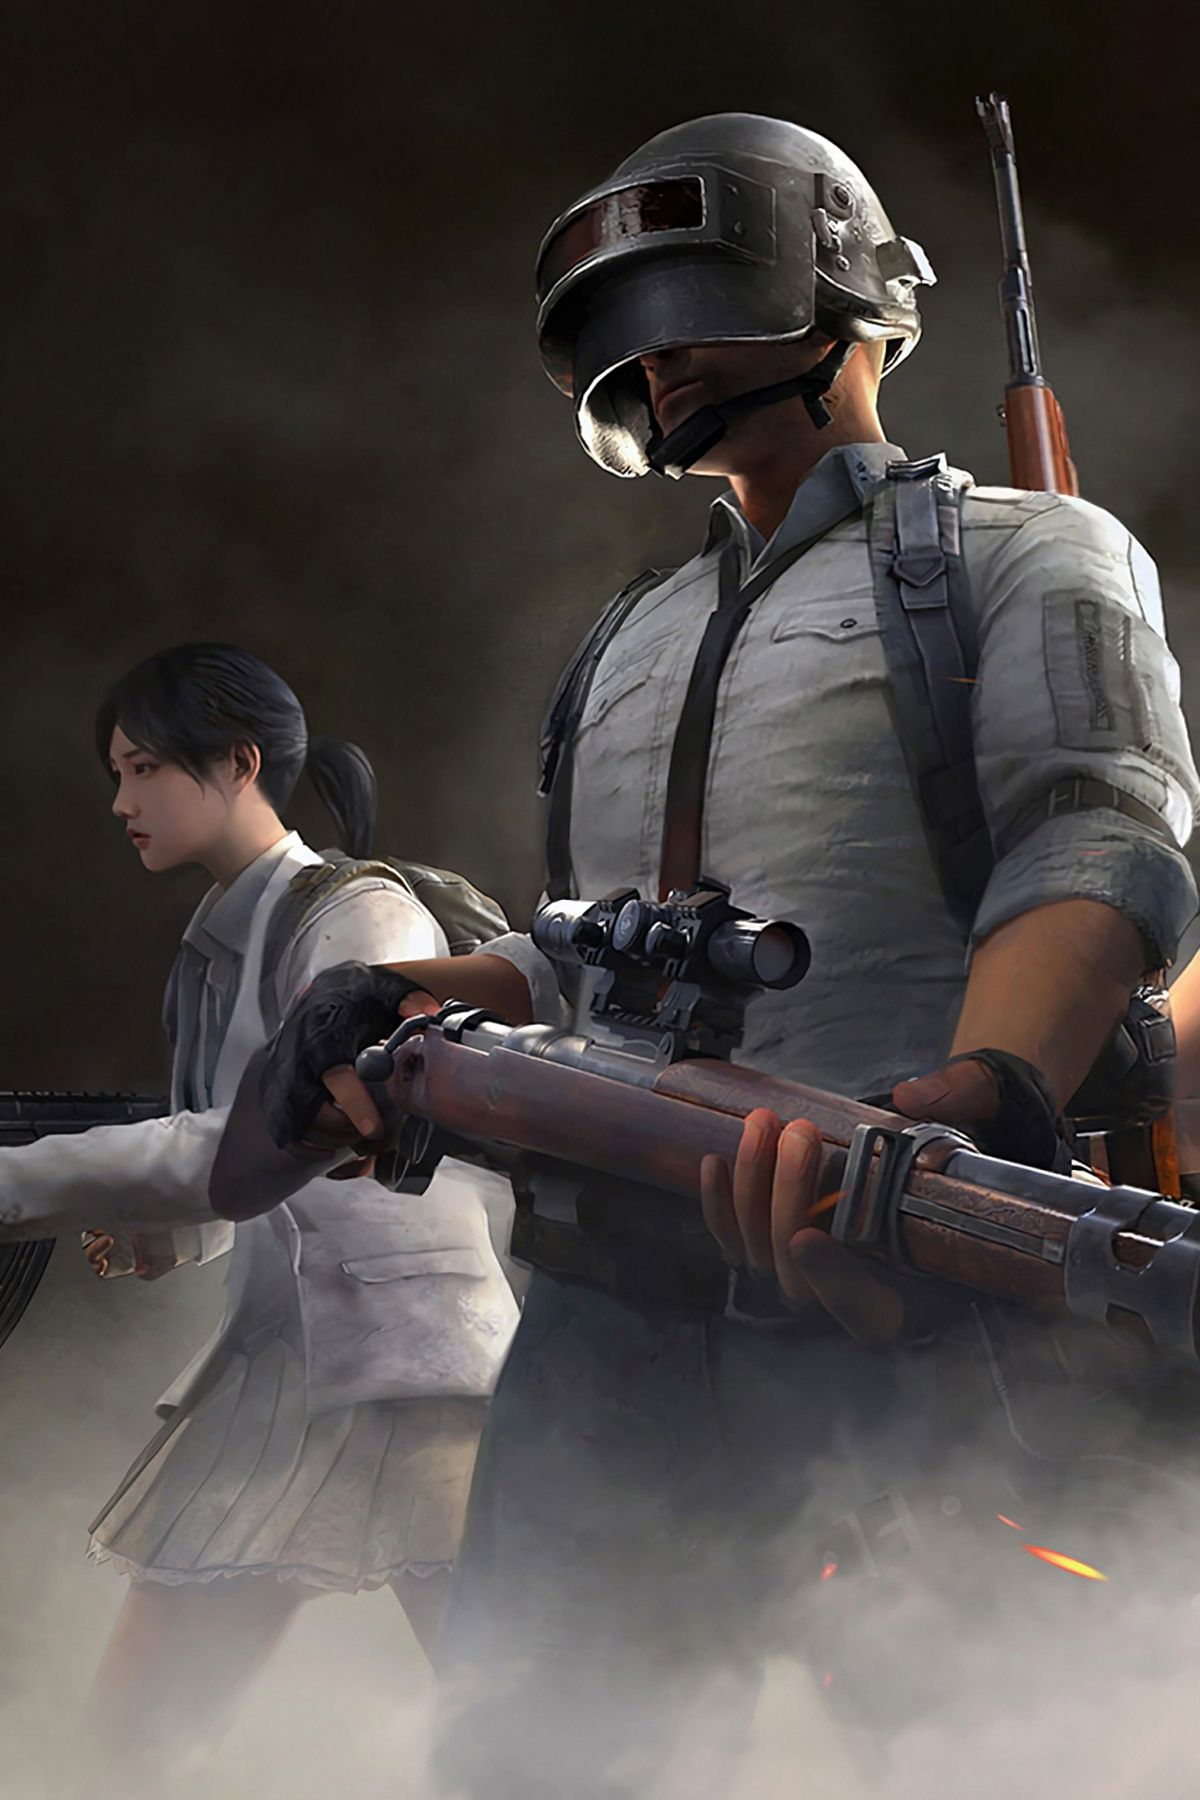 PUBG snipper guns team ready for match mobile wallpaper